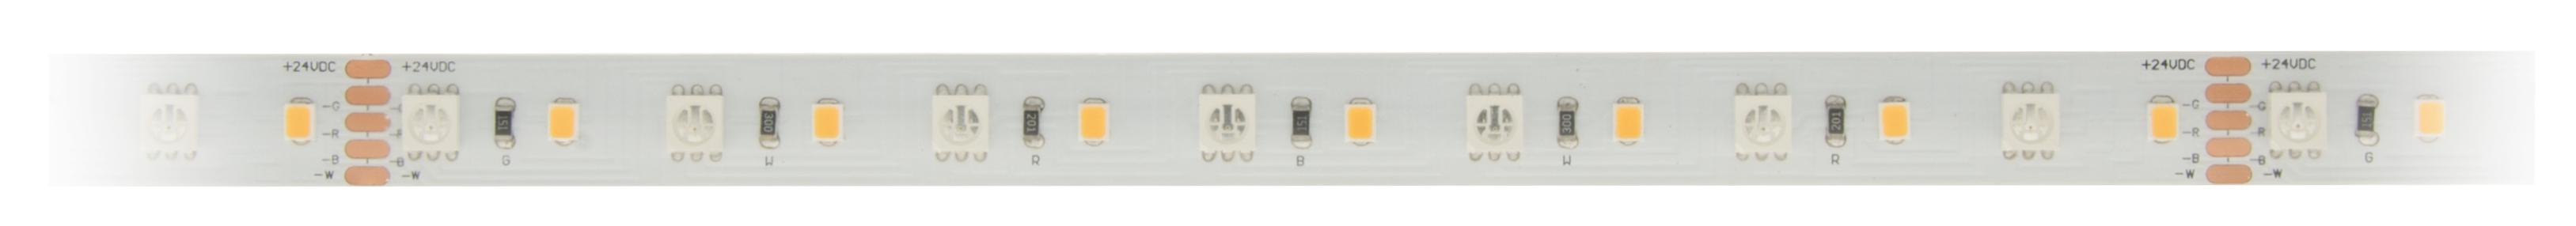 1 Stk Flexstrip 86 RGB NW Ra=90+, 11W/m 938lm/m, 24VDC,IP44, l=5m LIFS014003